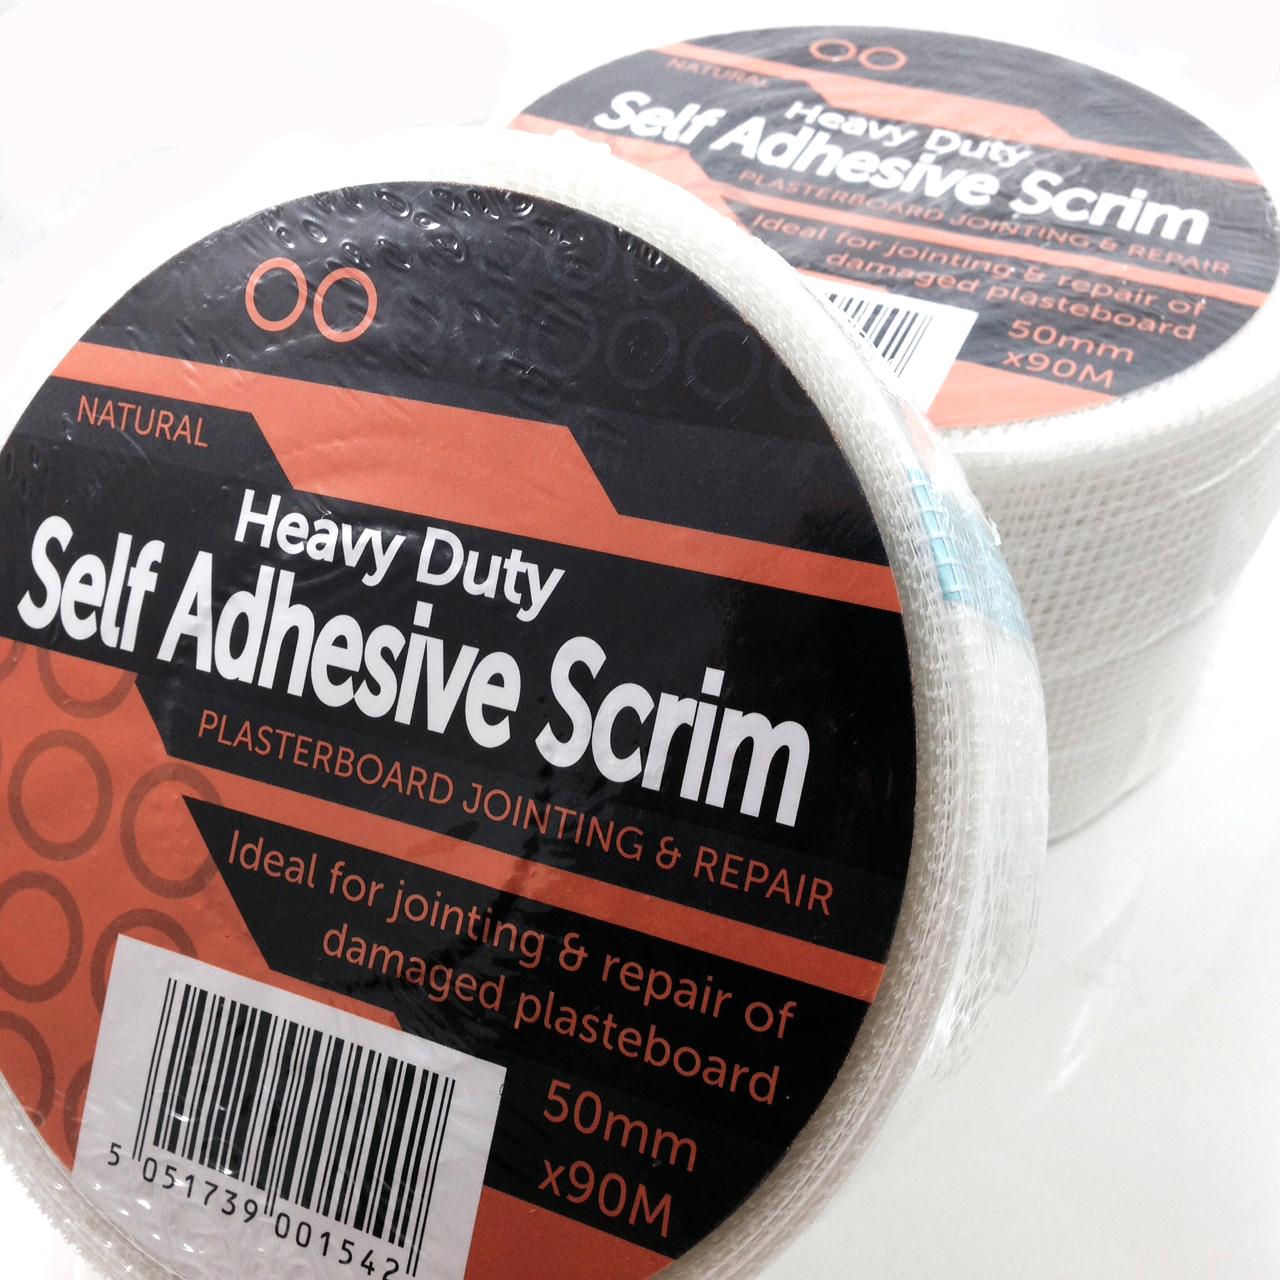 Adhesive Paper Drywall Tape : Roll of drywall self adhesive scrim tape m mm ebay